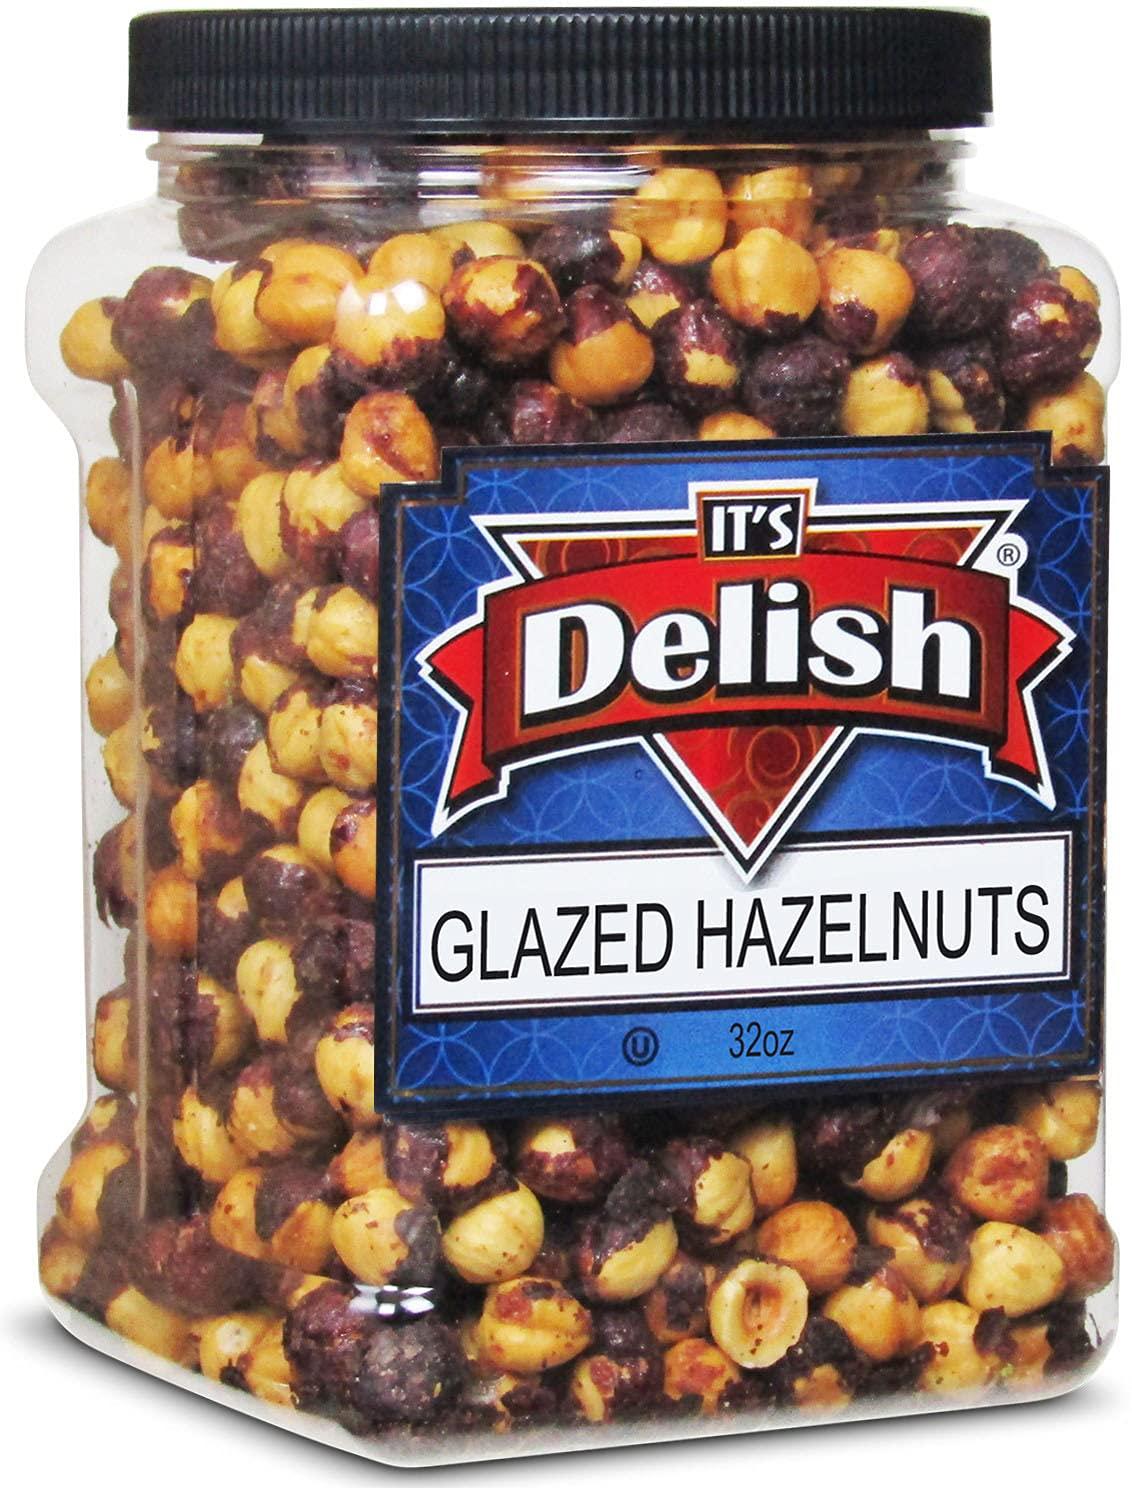 Gourmet Glazed Hazelnuts by Its Delish Con Jumbo Reusable 30 Ranking TOP18 Oz Import